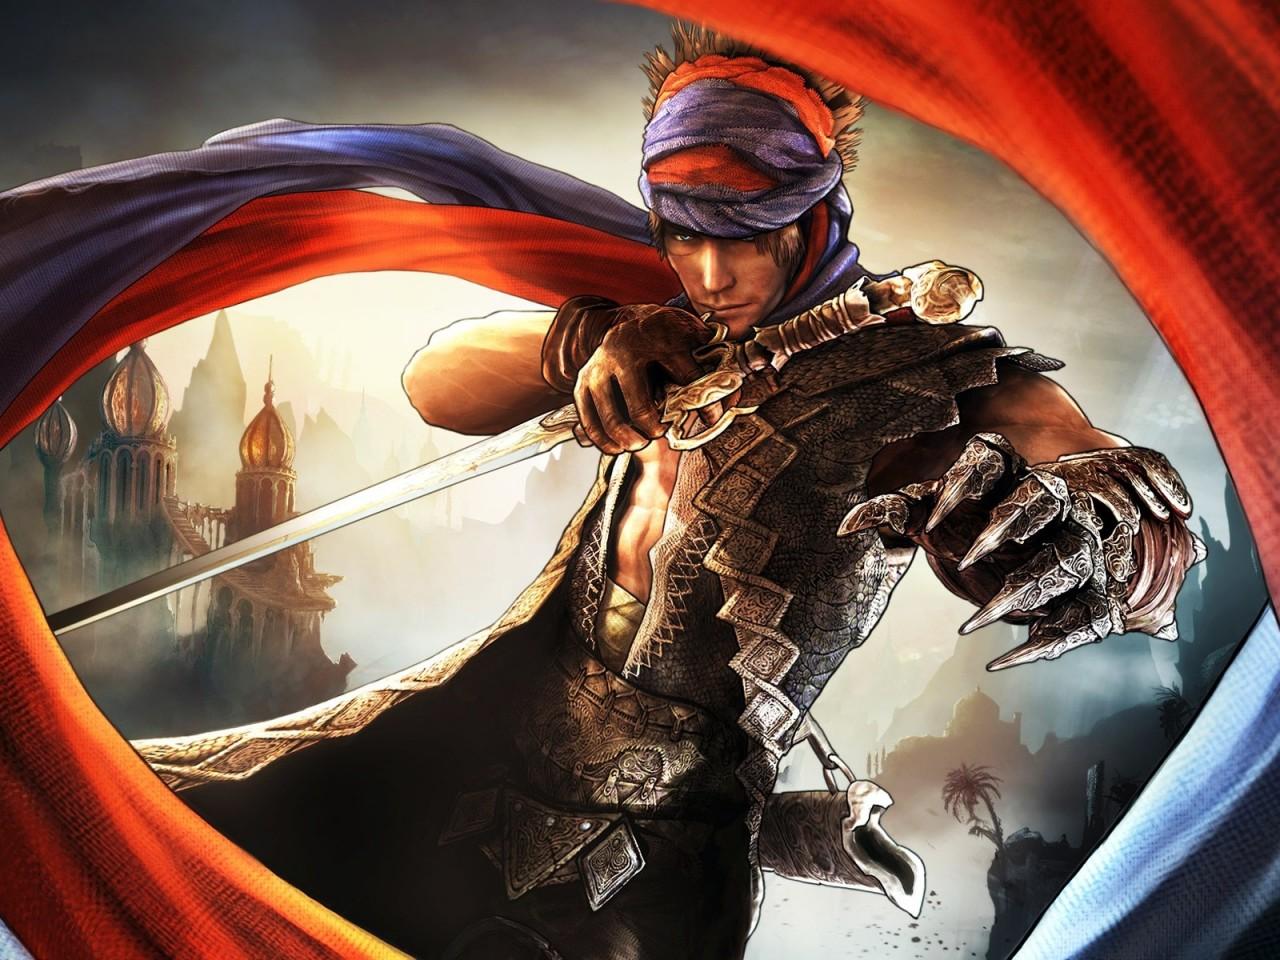 Wallpaper 3d Espada Prince Of Persia Game Wallpapers Hd Wallpapers Id 9047